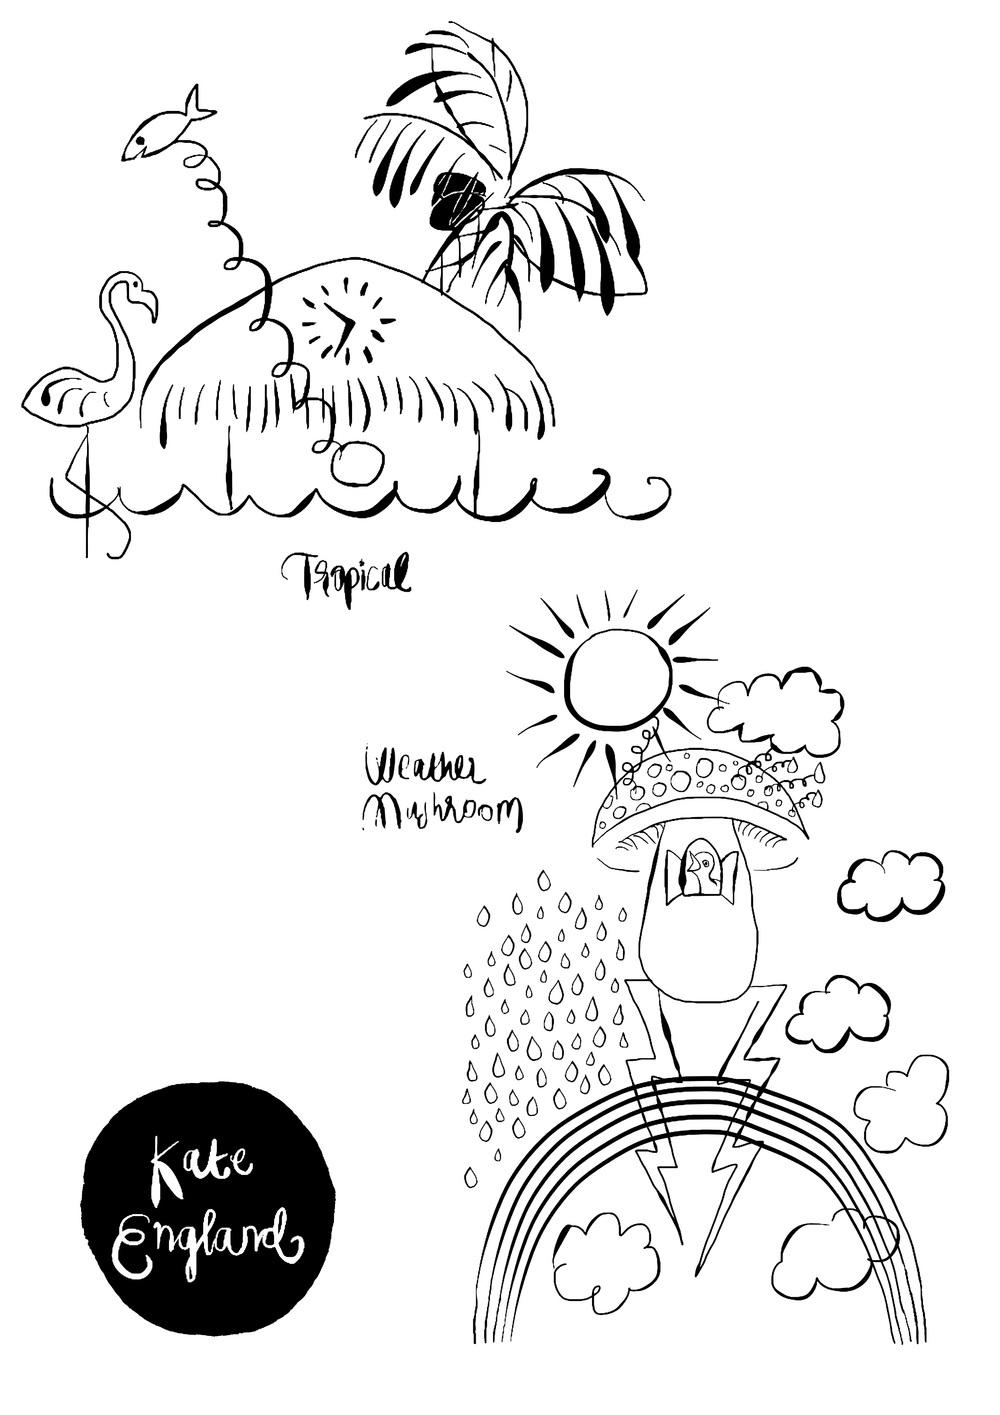 more-cuckoo-sketches.jpg